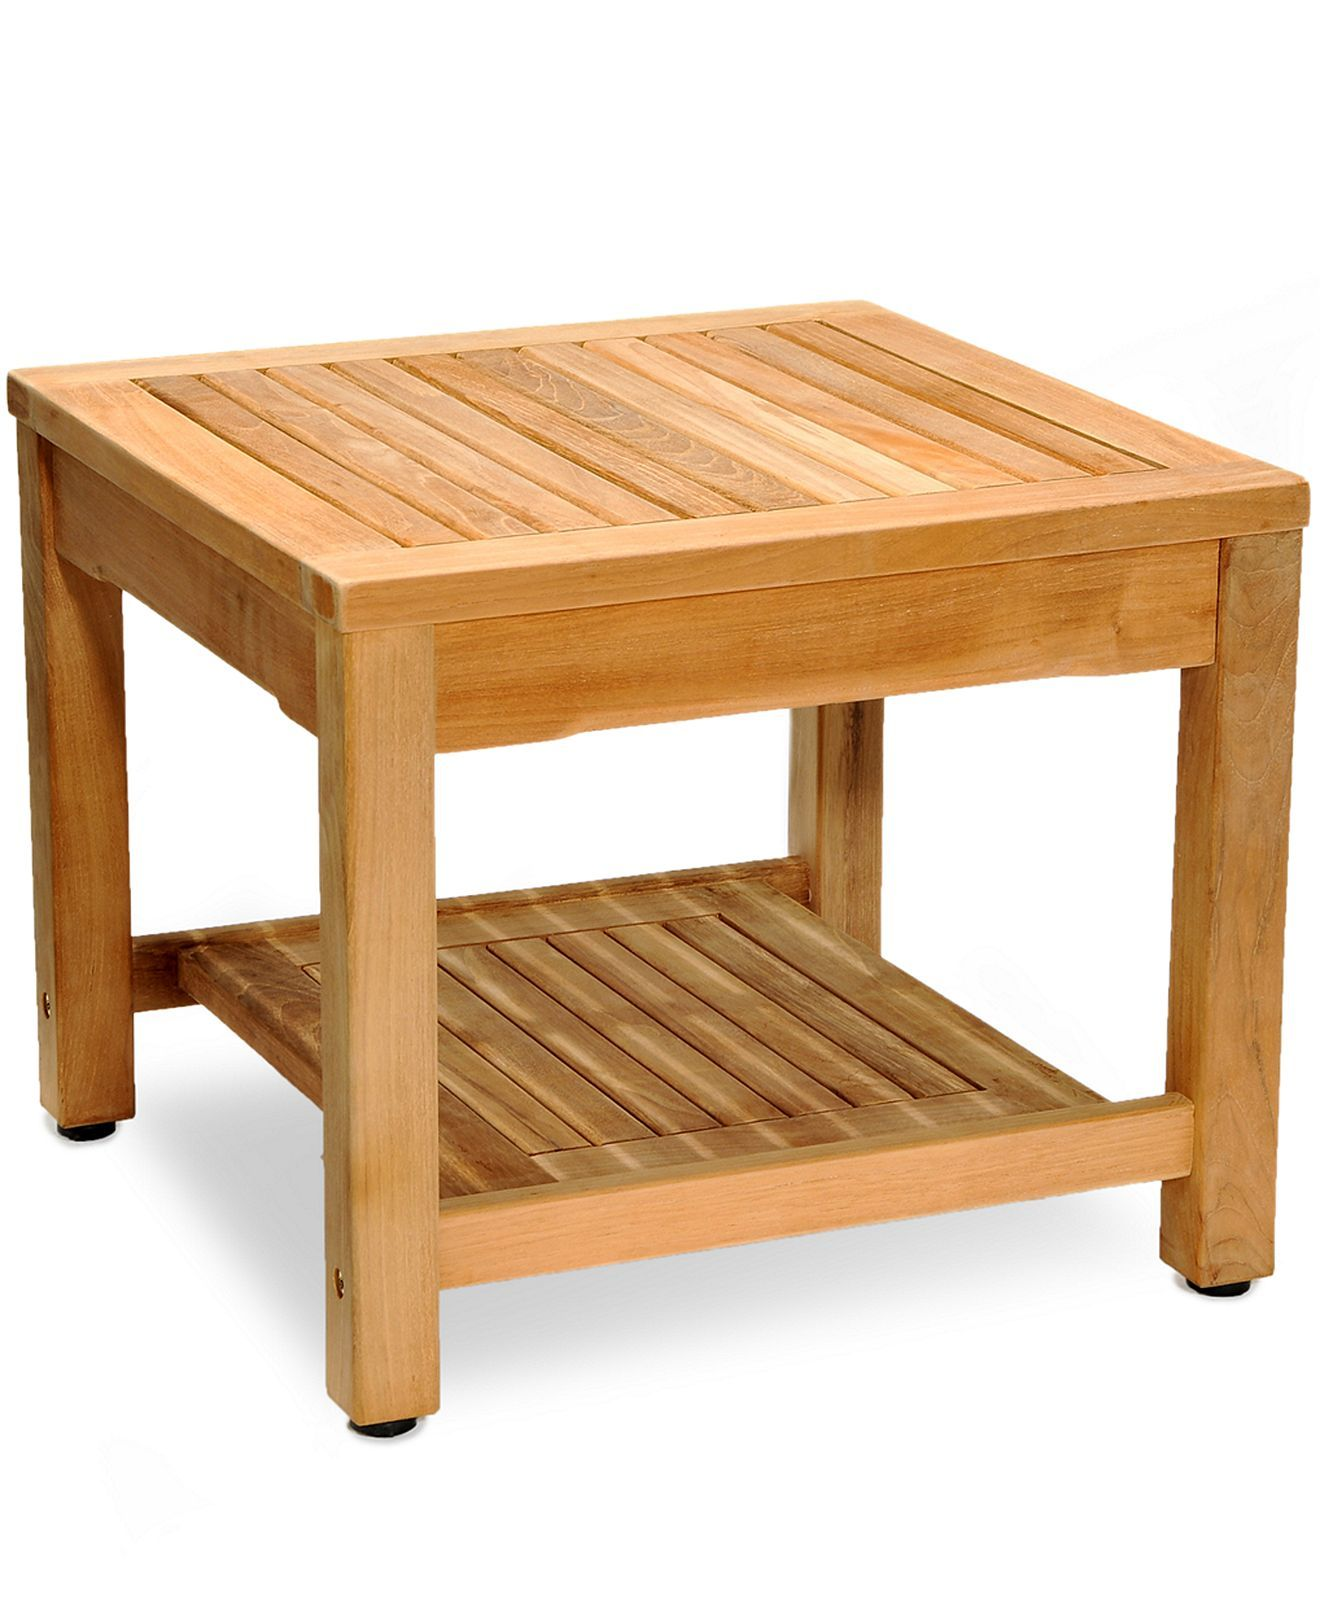 Bristol Teak Patio Furniture Outdoor Side Table Macy S